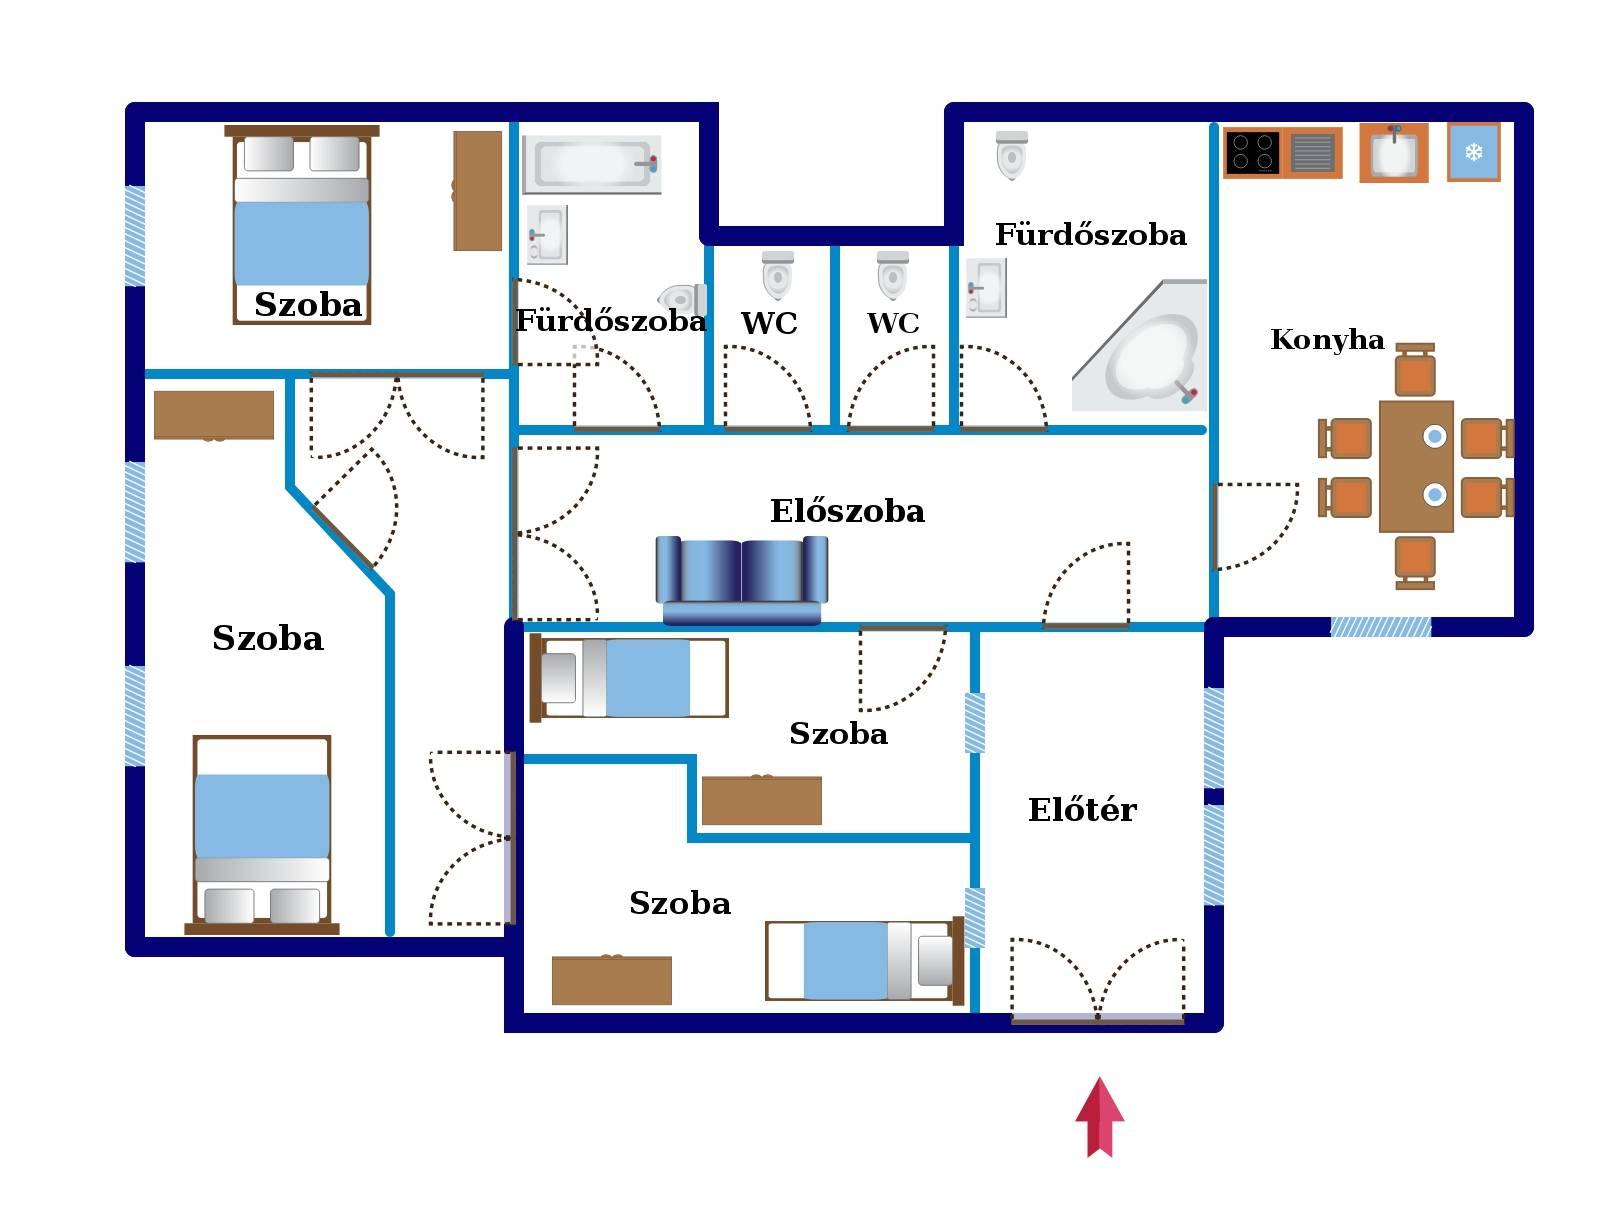 District 6, Rózsa utca 48